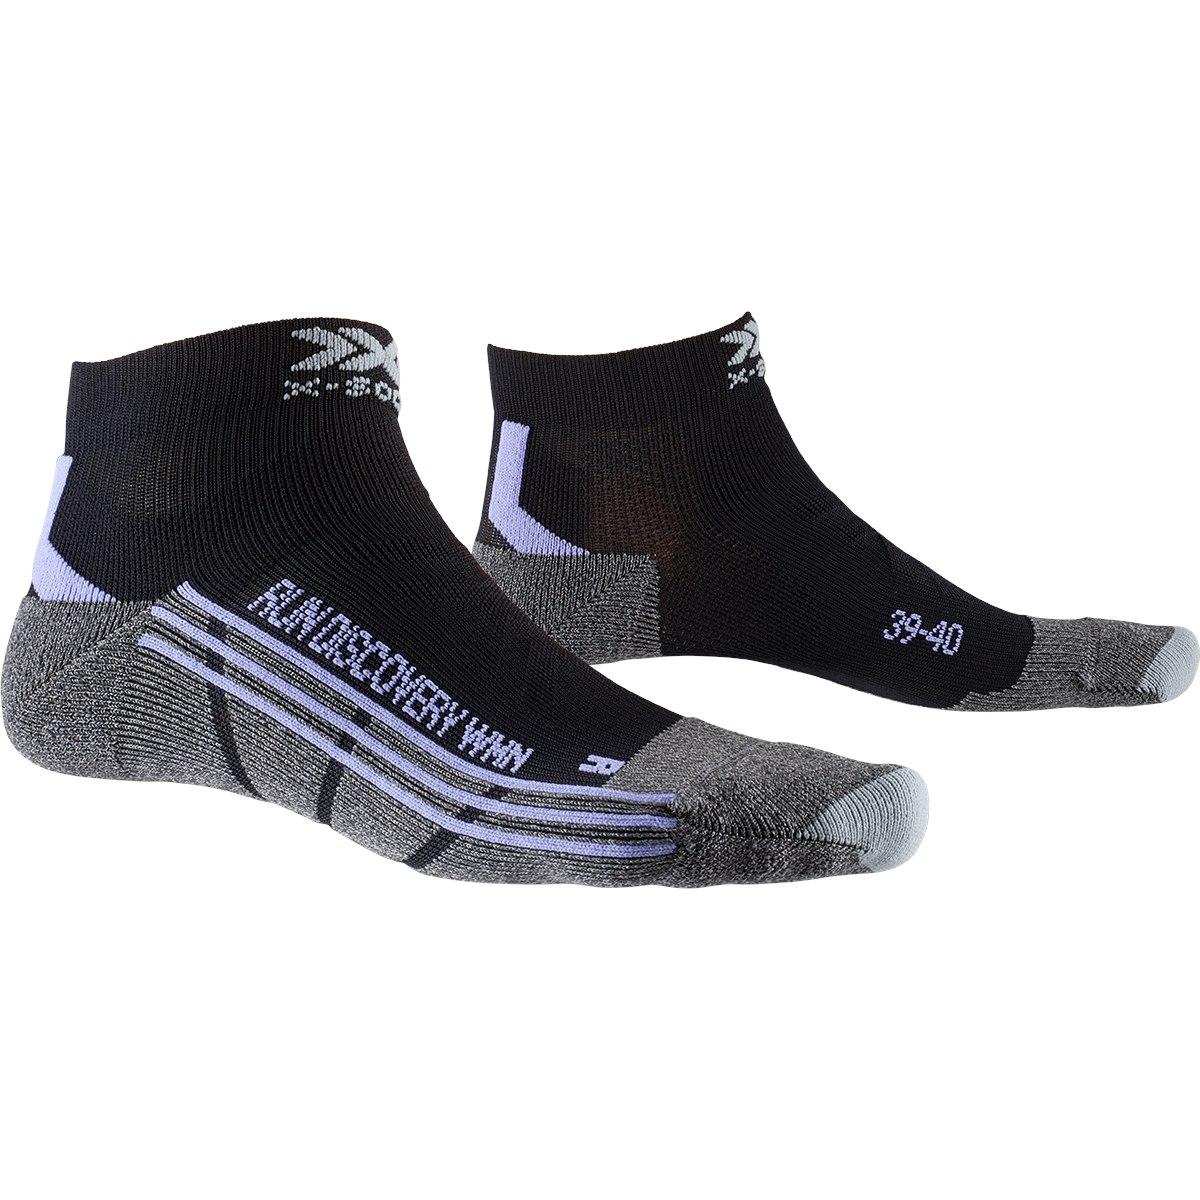 X-Socks Run Discovery Damen Laufsocken - black/pink